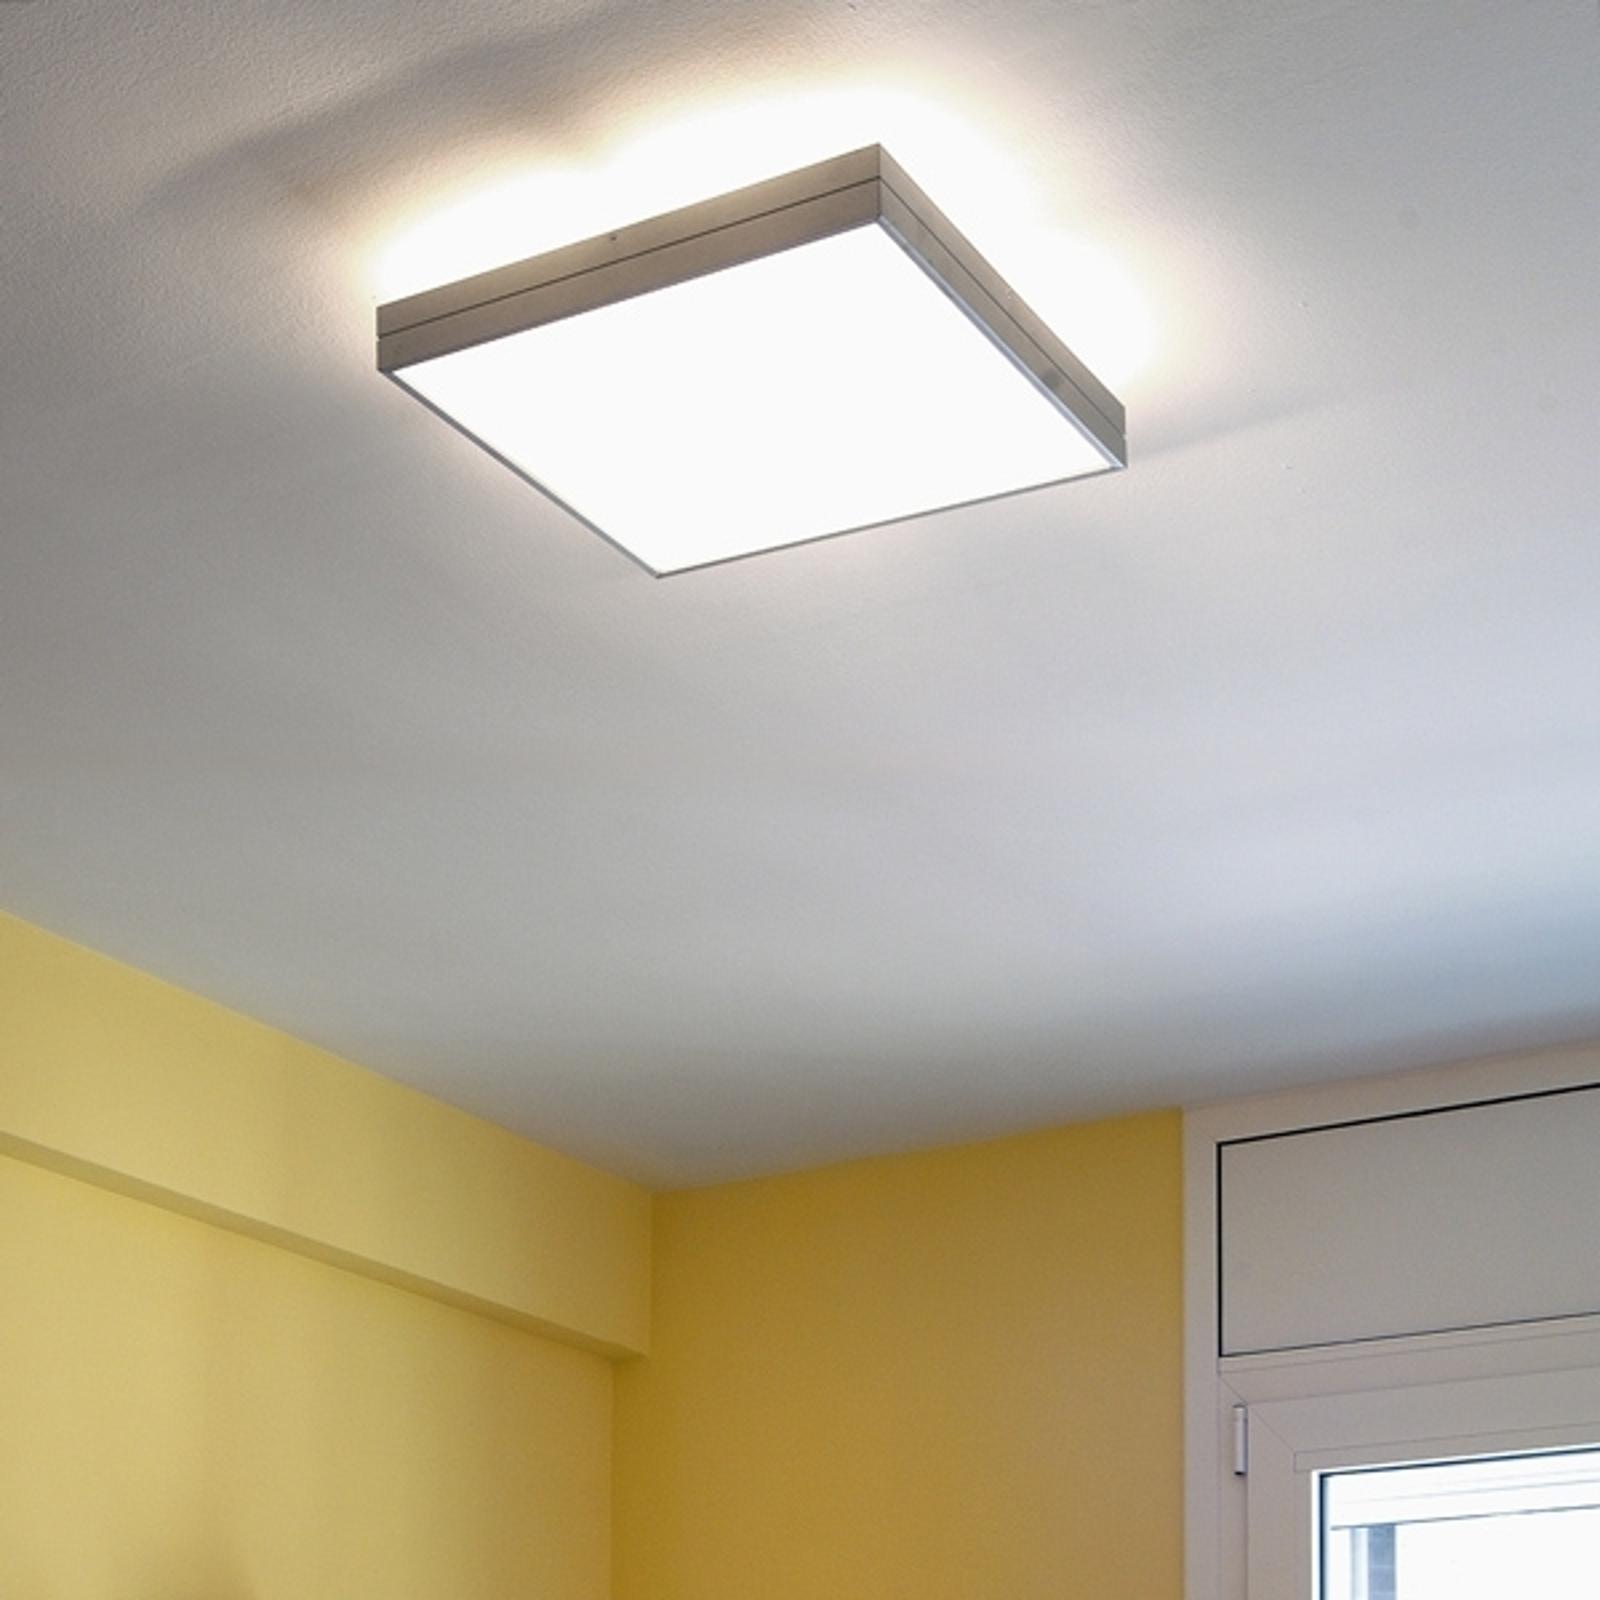 Linea - strak vormgegeven plafondlamp, 42 cm